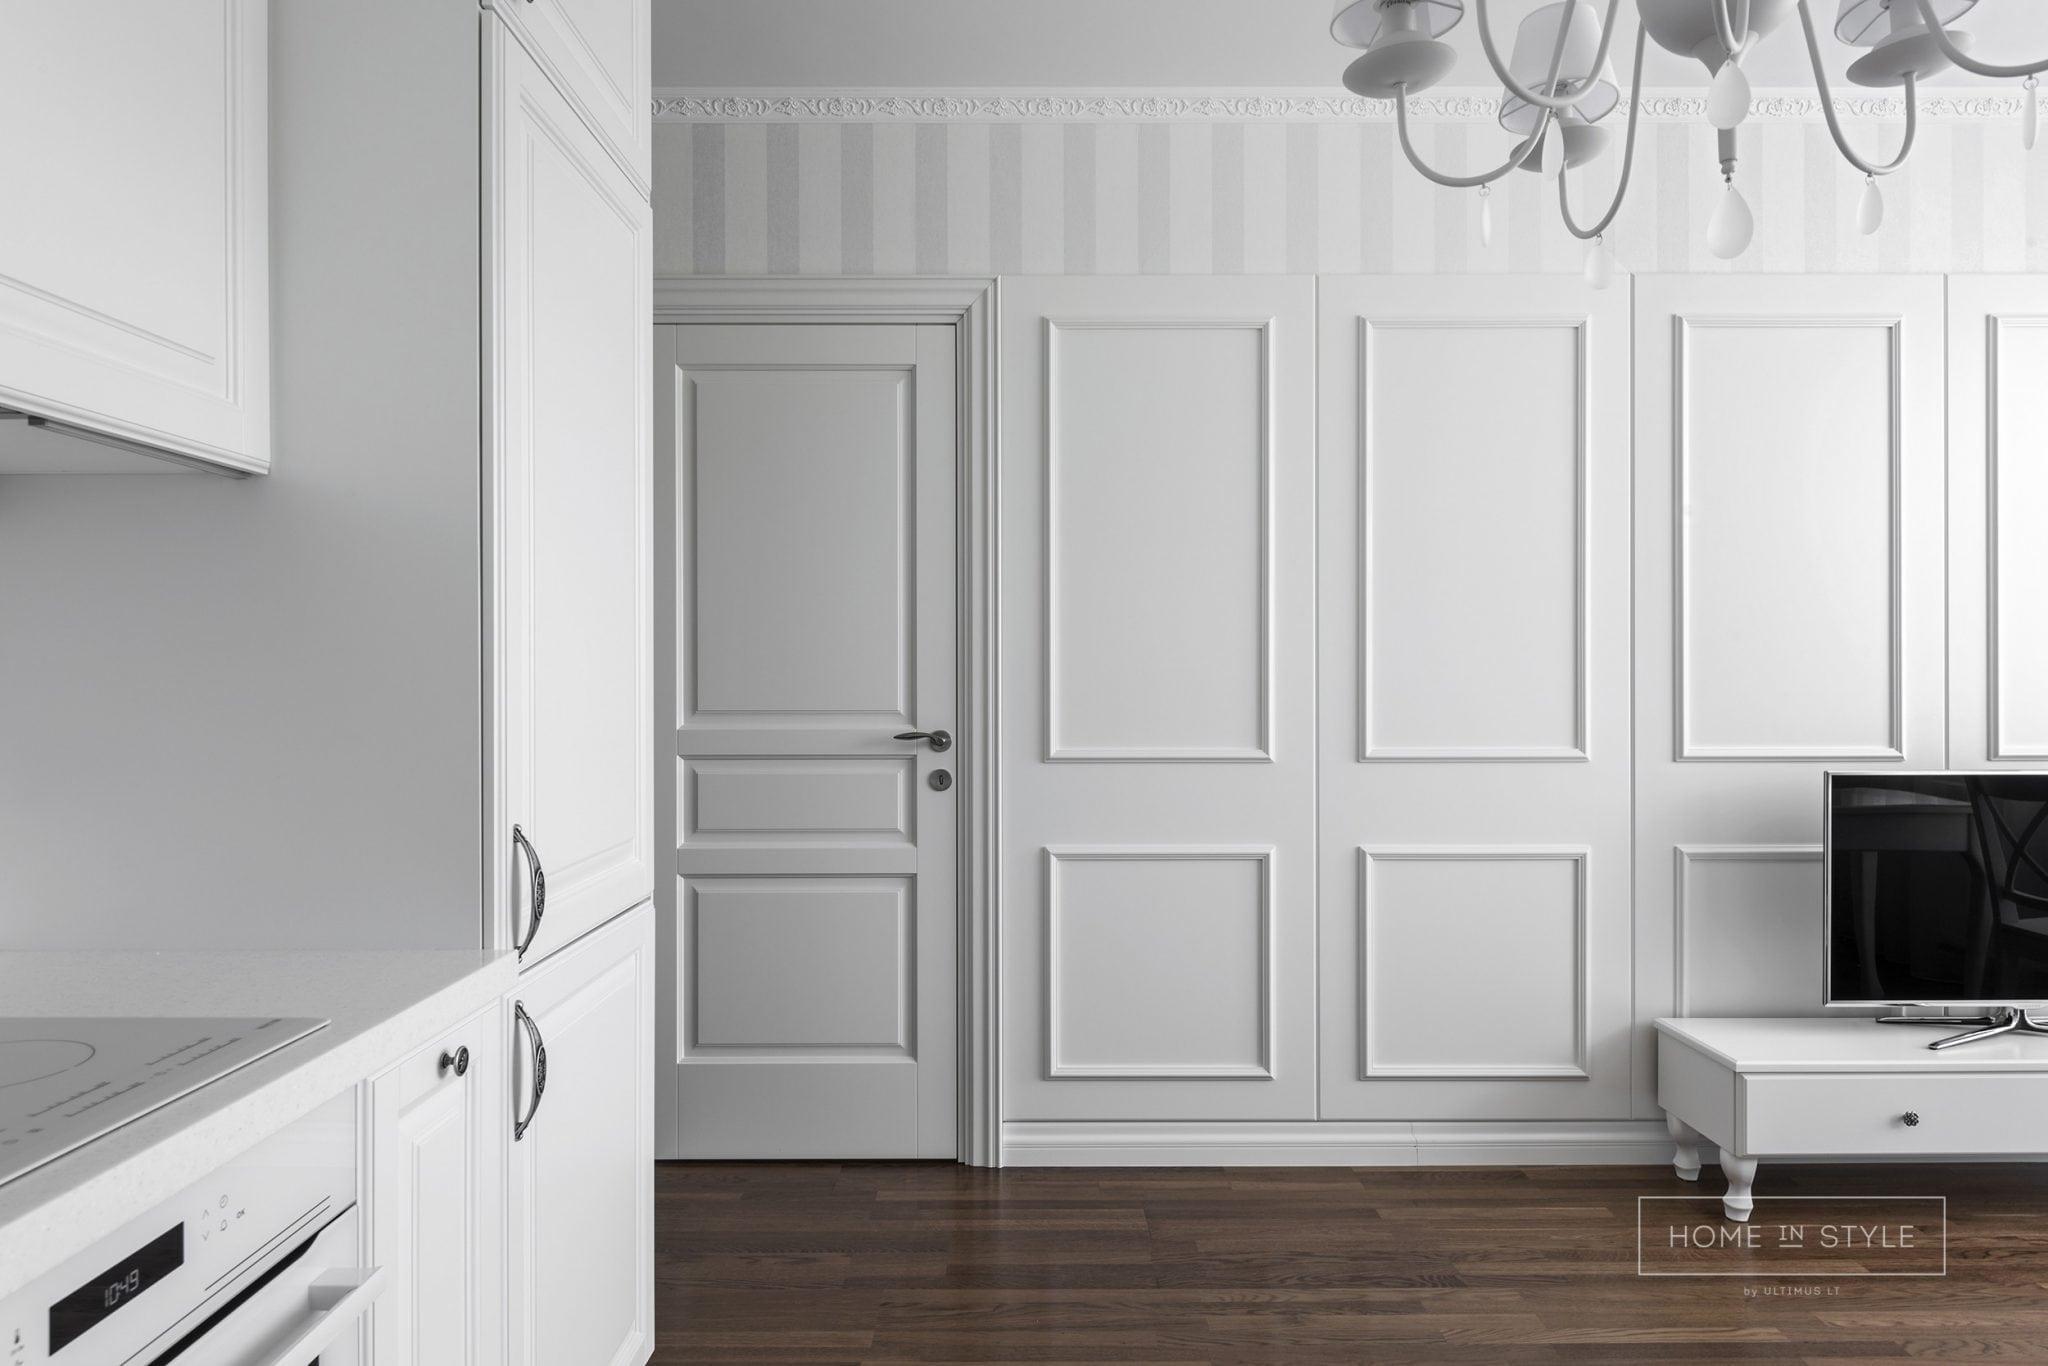 Klasikinis interjeras baldu gamyba Home in style